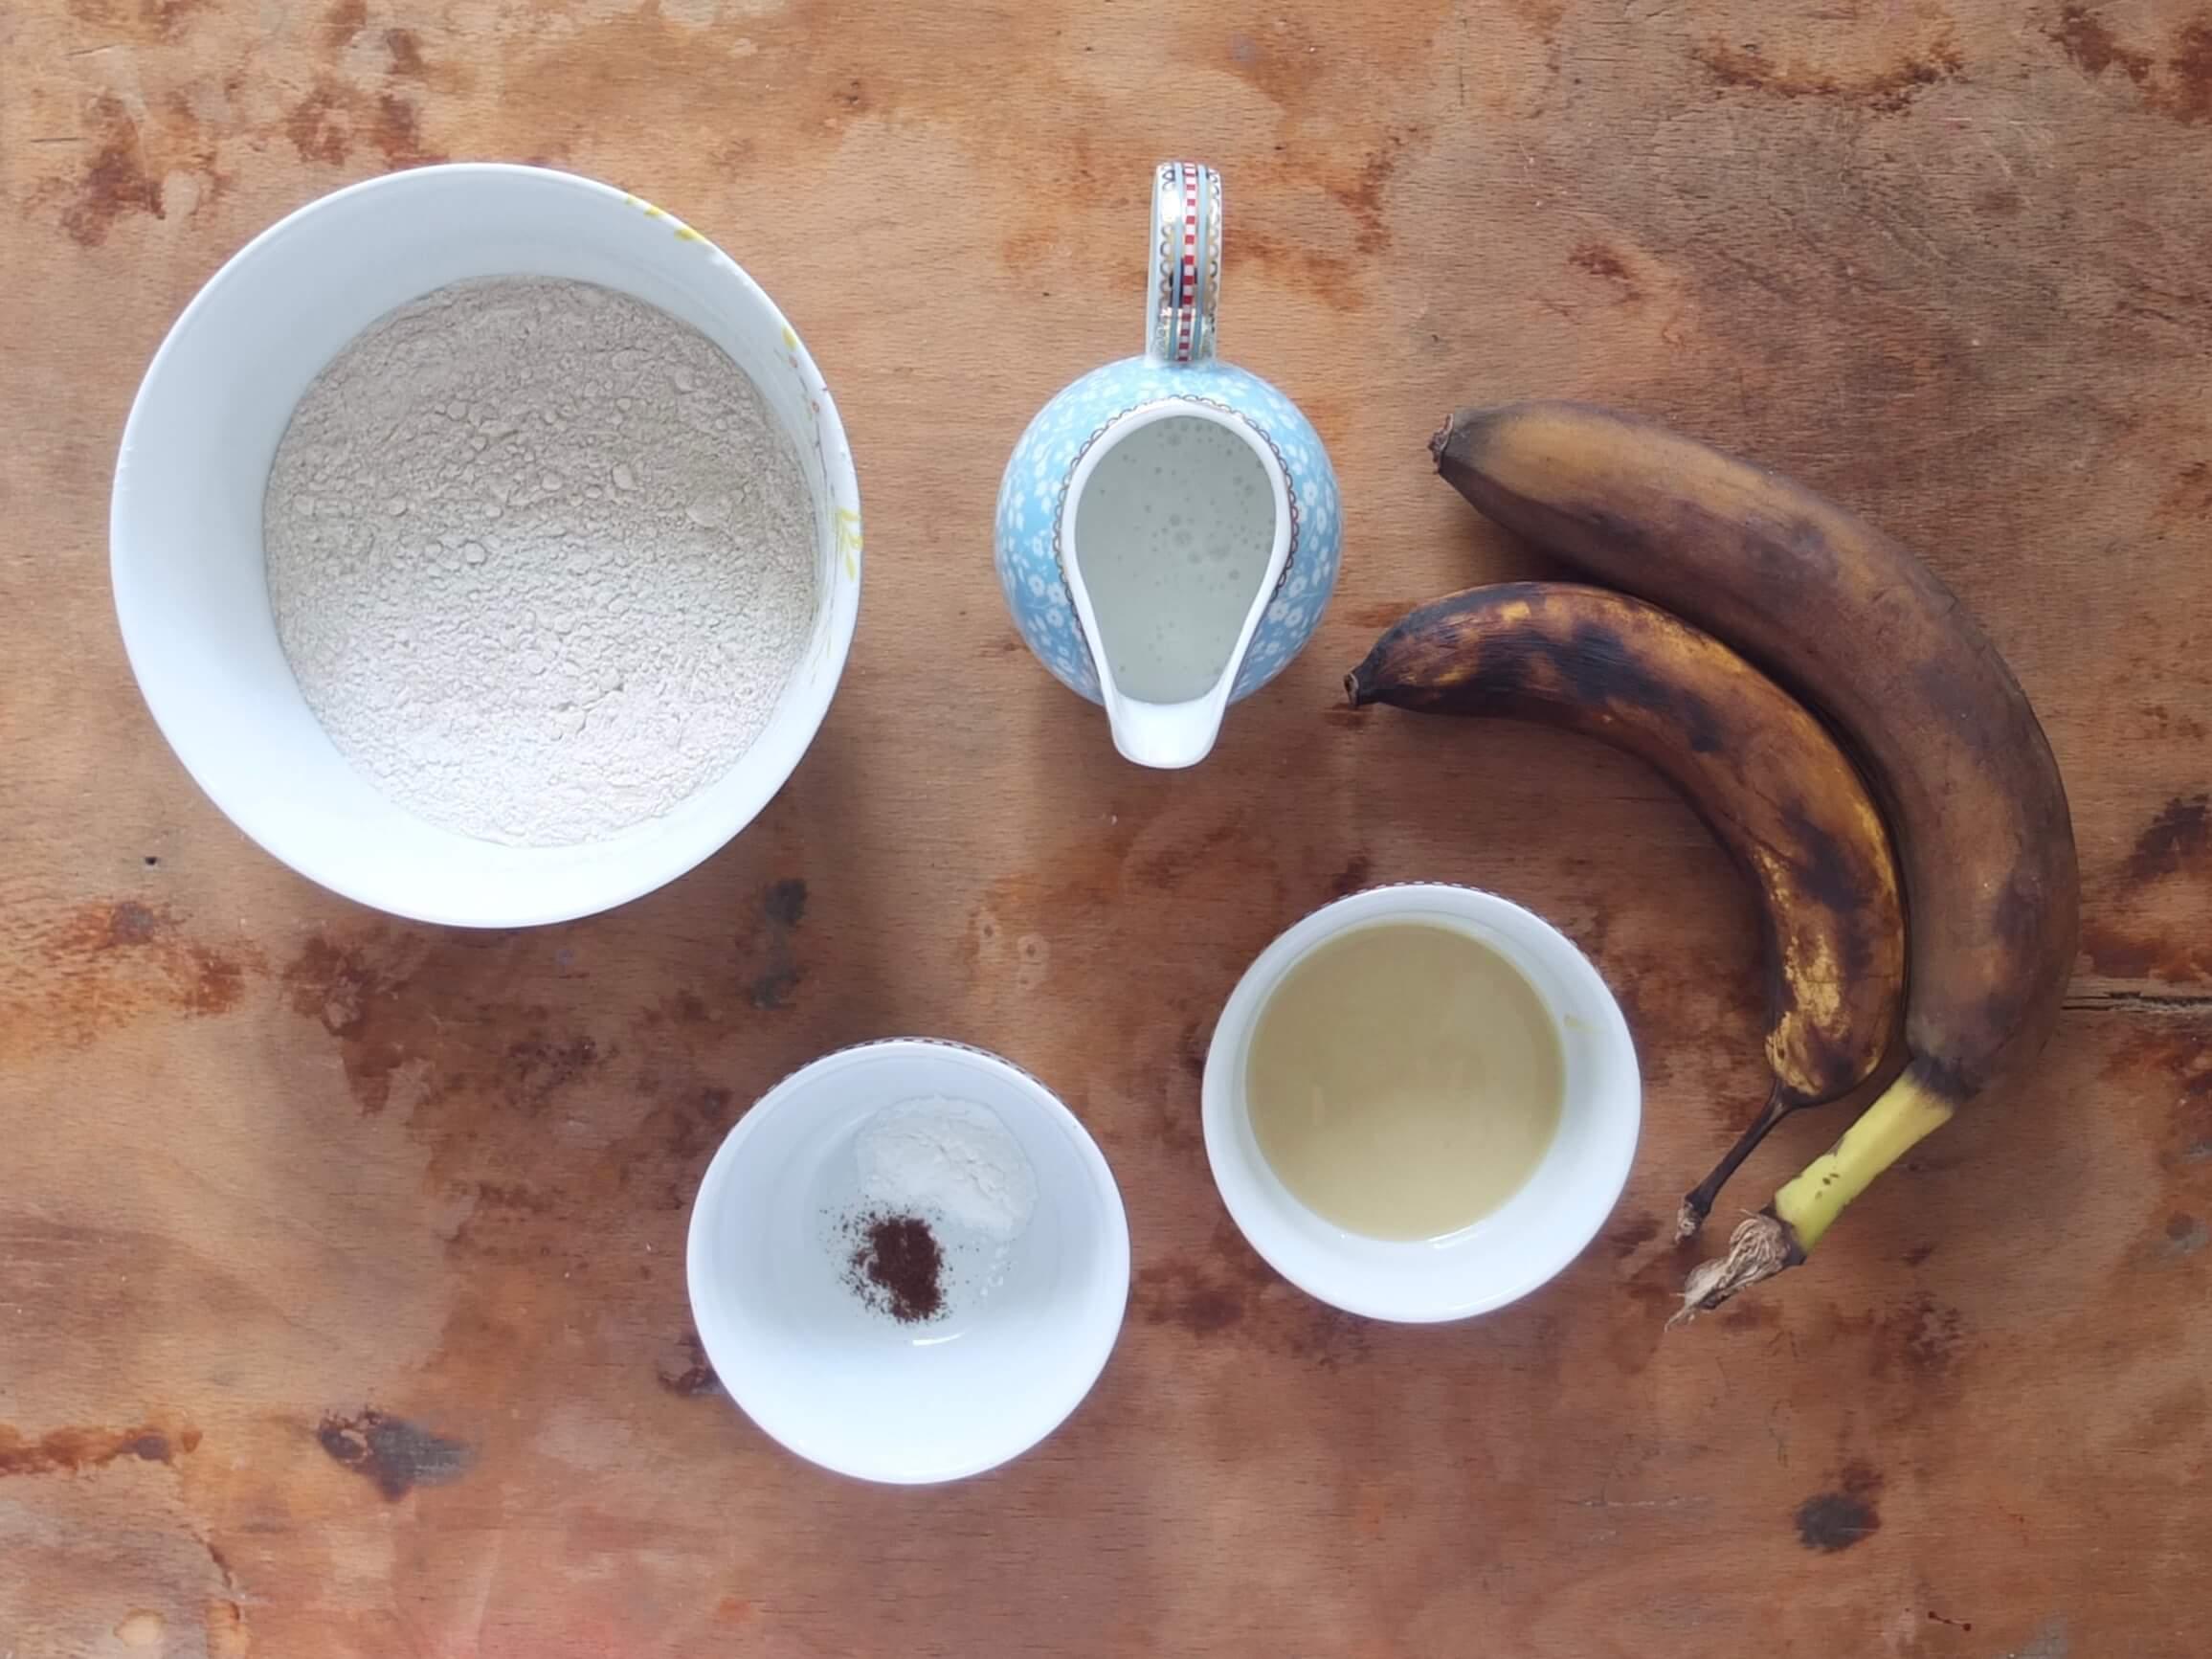 Zutaten Vegane Buchweizen-Bananen-Pancakes - La Crema Patisserie Foodblog Backblog